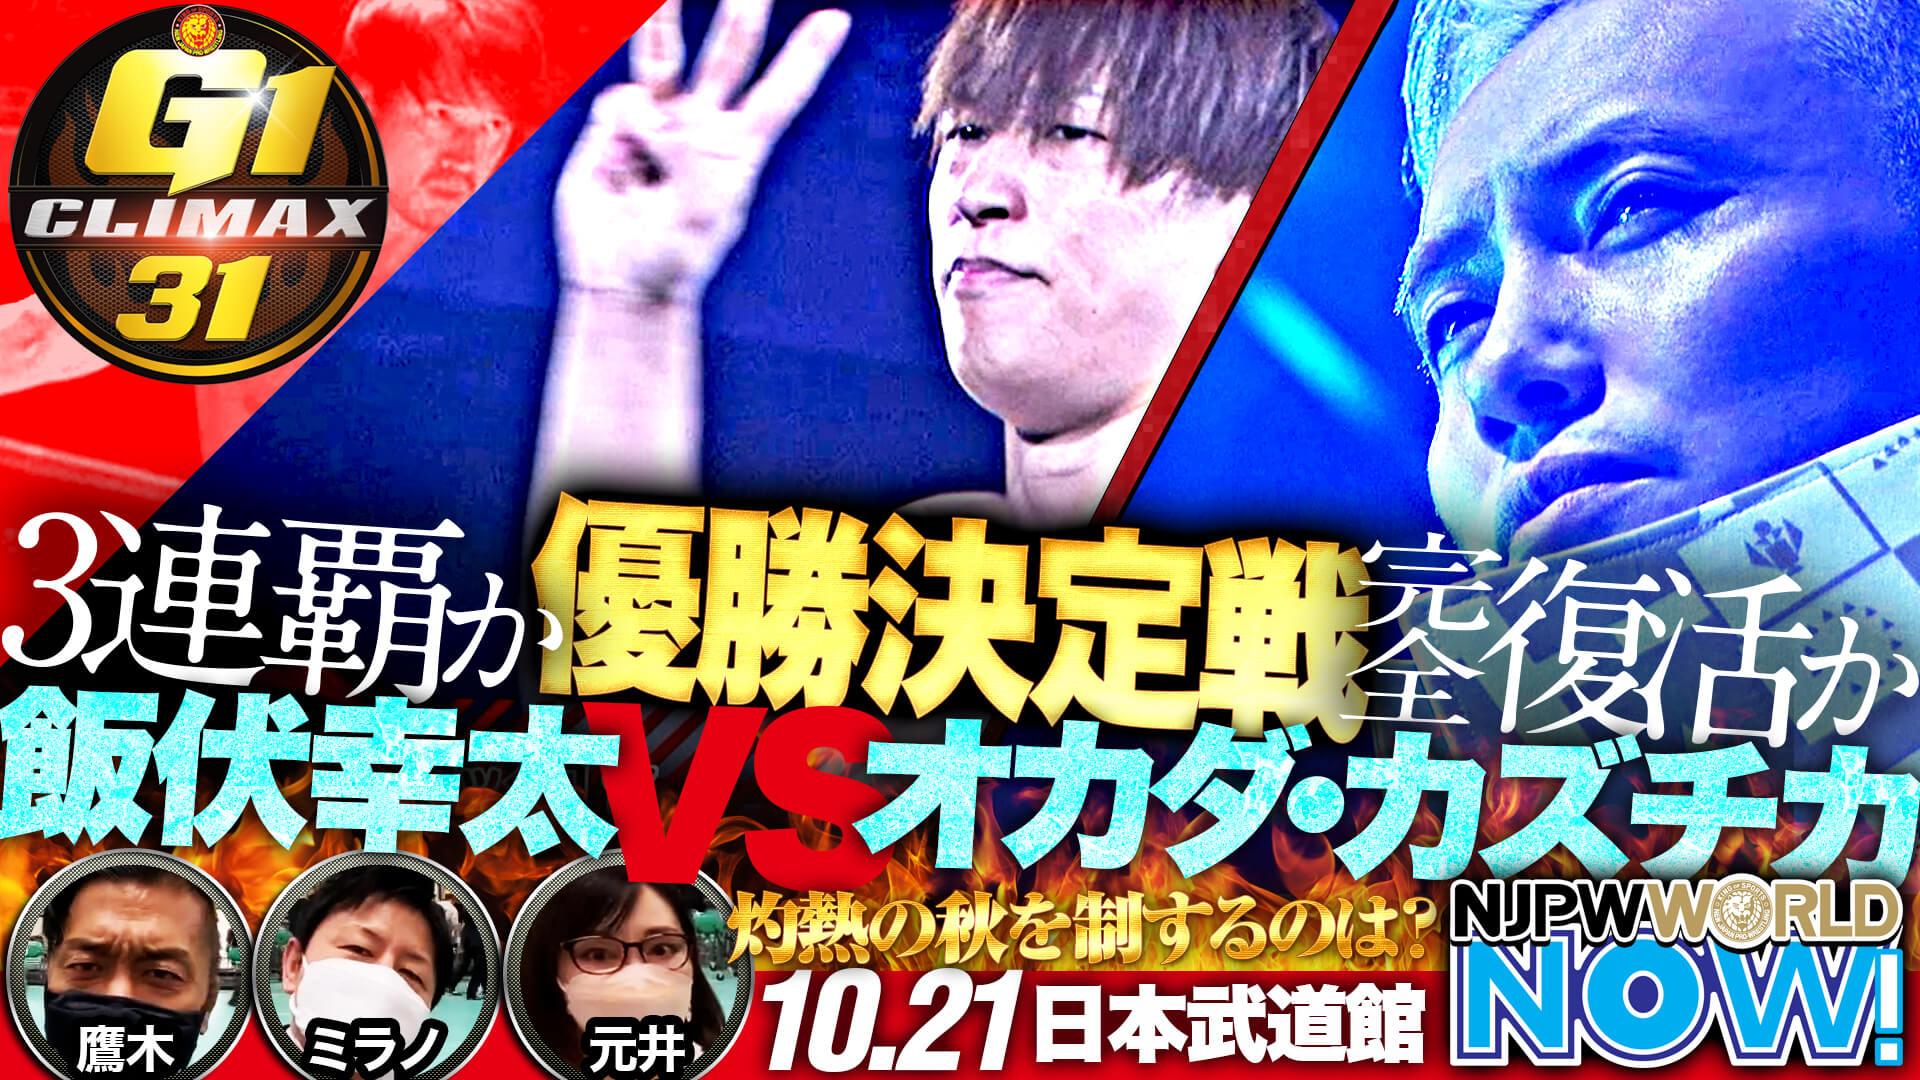 G1優勝決定戦❗️飯伏幸太vsオカダ・カズチカ❗️鷹木&元井&ミラノが解説‼️